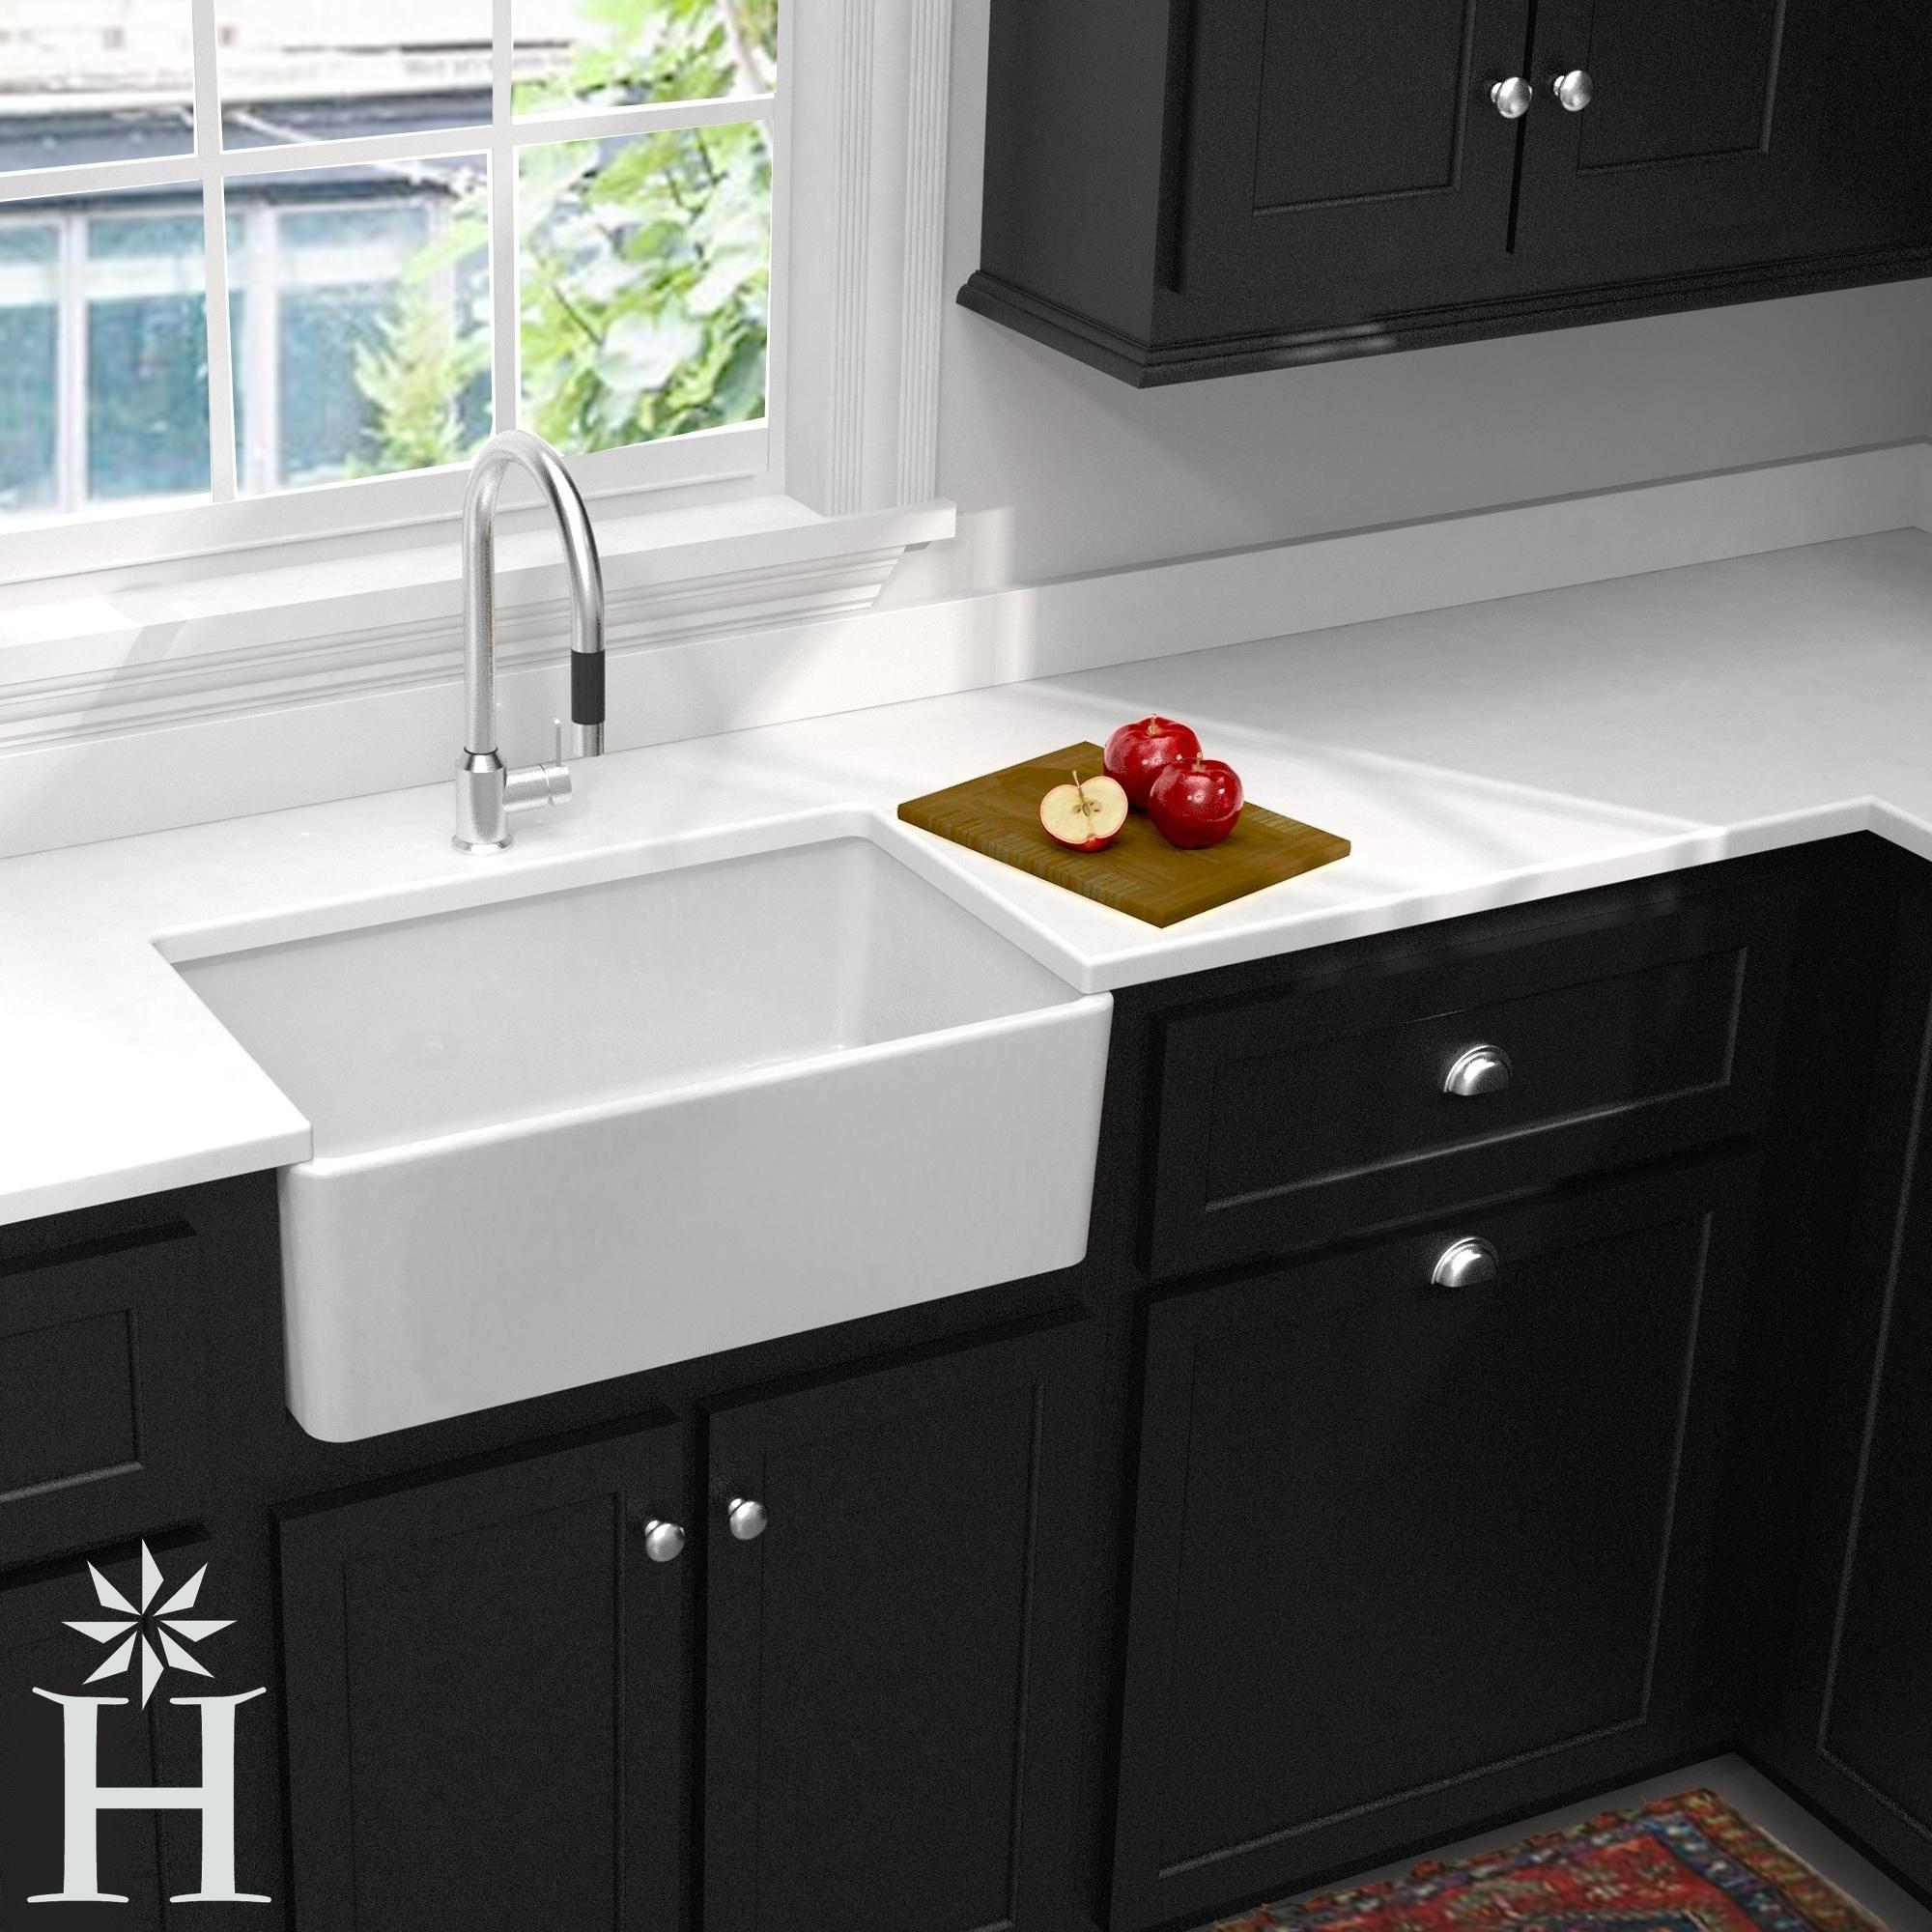 buy undermount kitchen sinks online at overstock our best sinks deals rh overstock com  overstock kitchen sink faucets